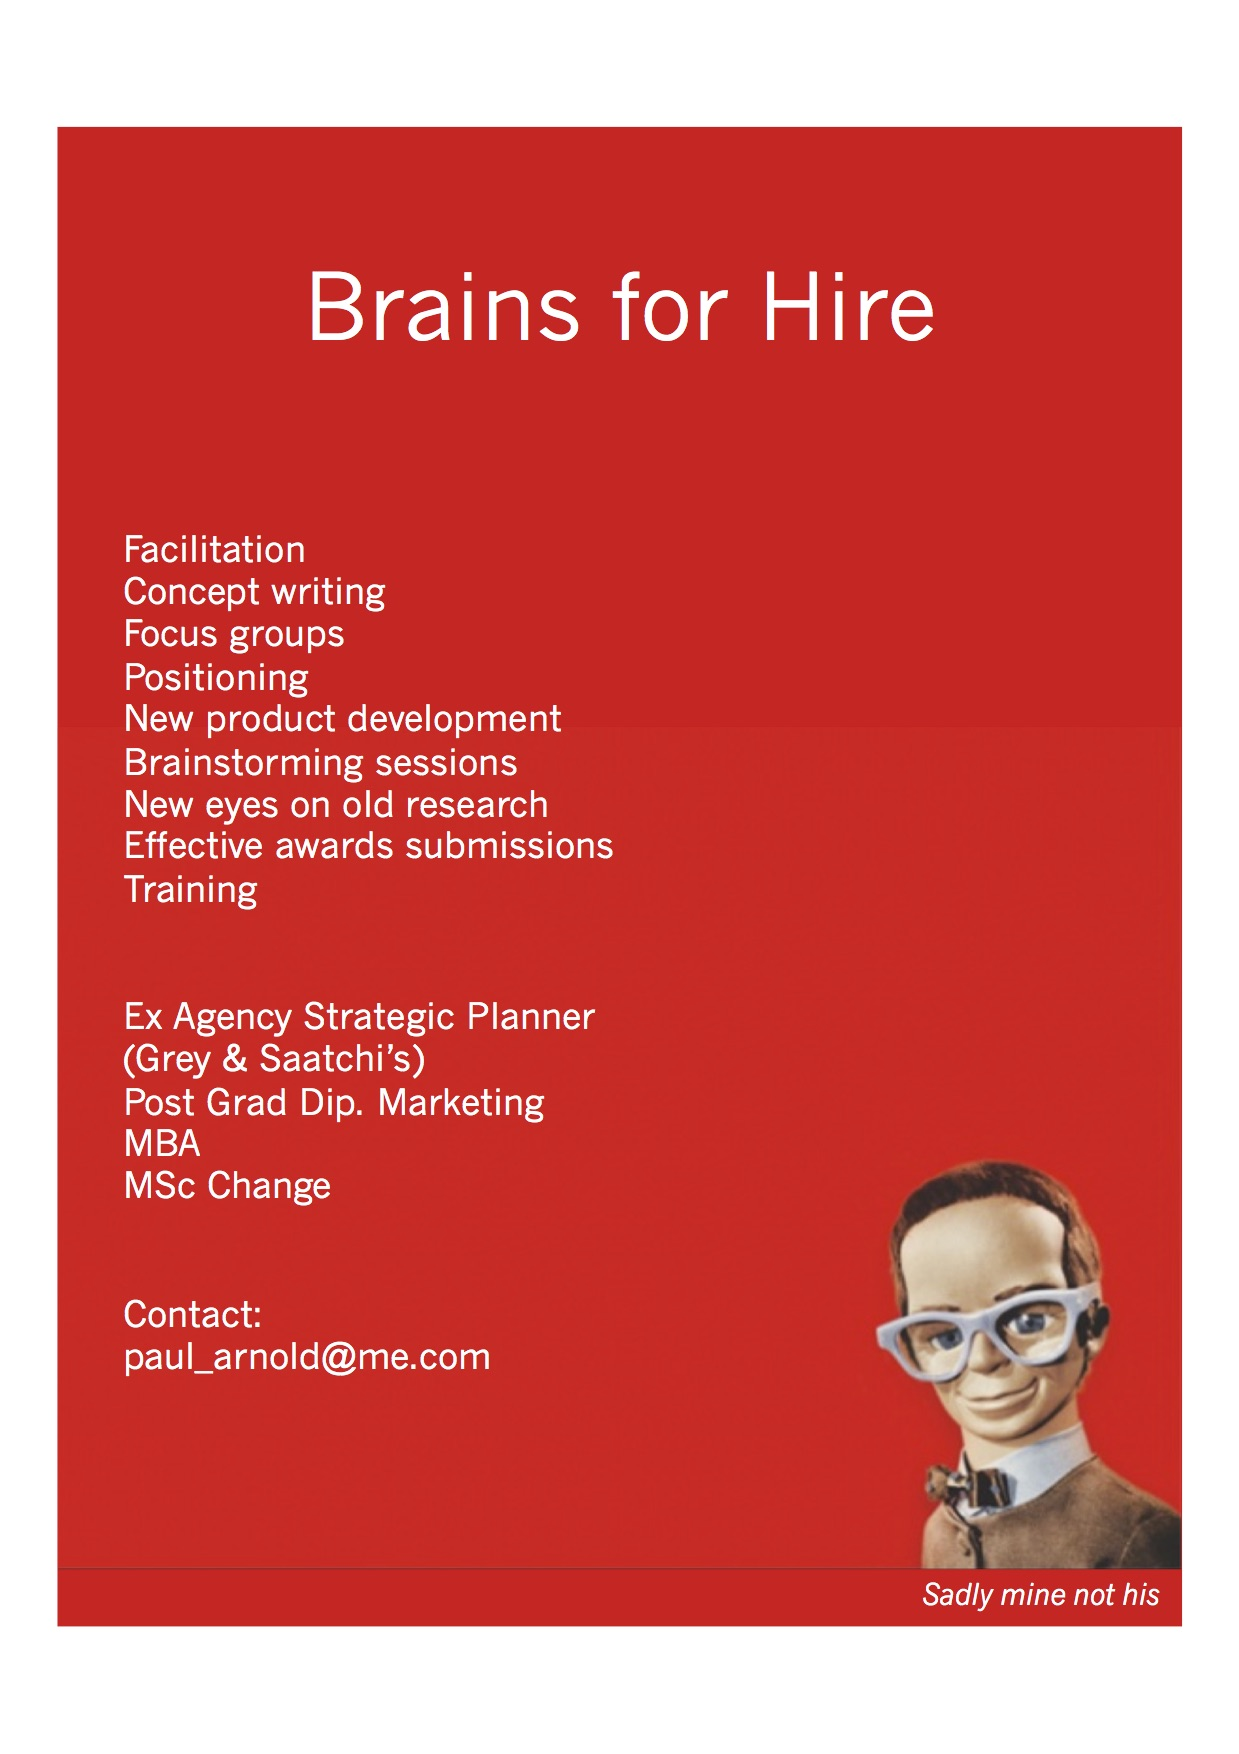 Brain for hire copy